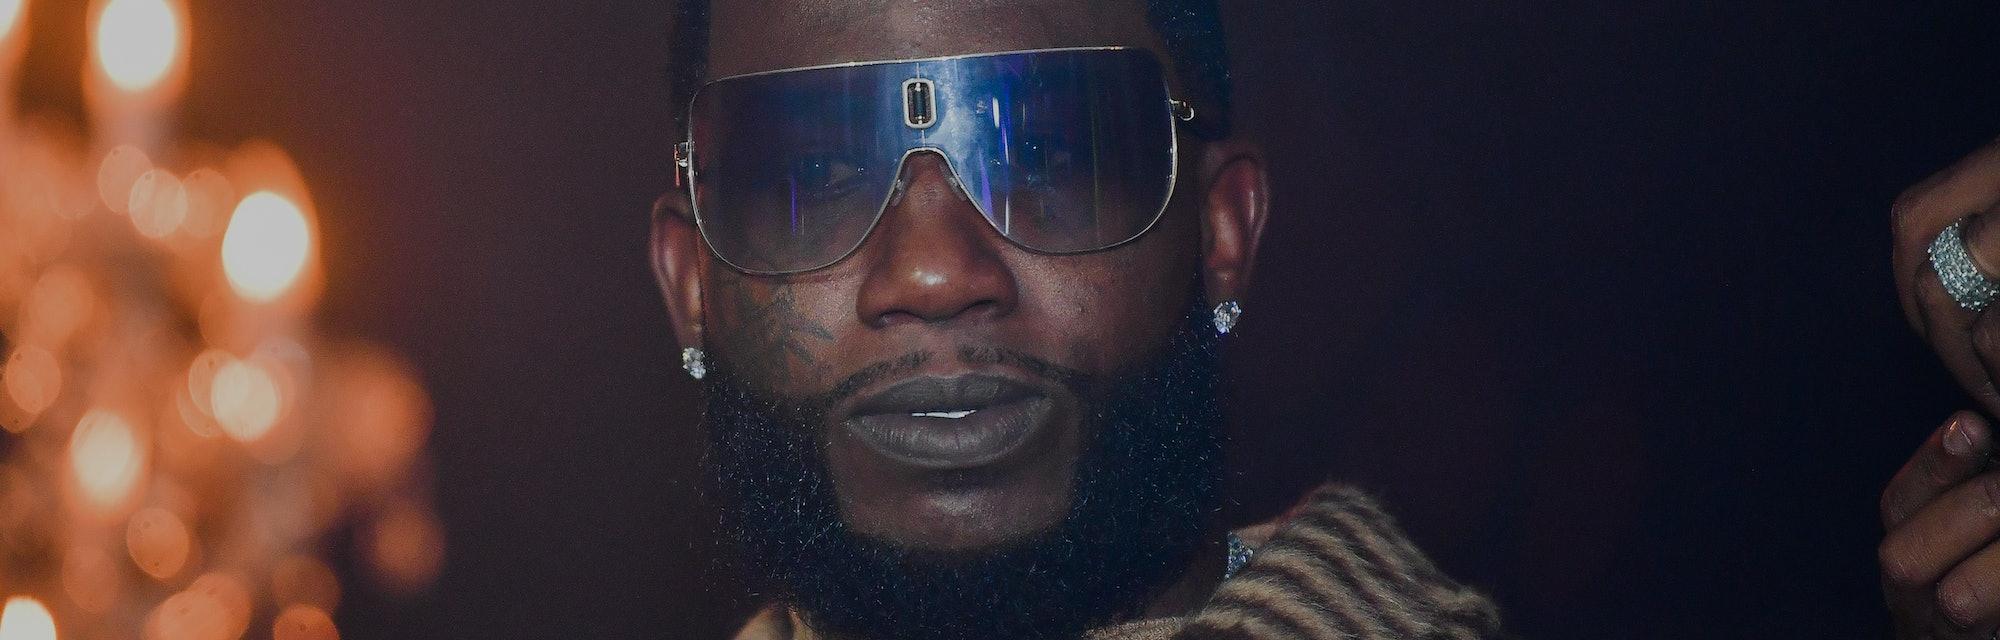 Trap legend Gucci Mane is seen wearing sunglasses.